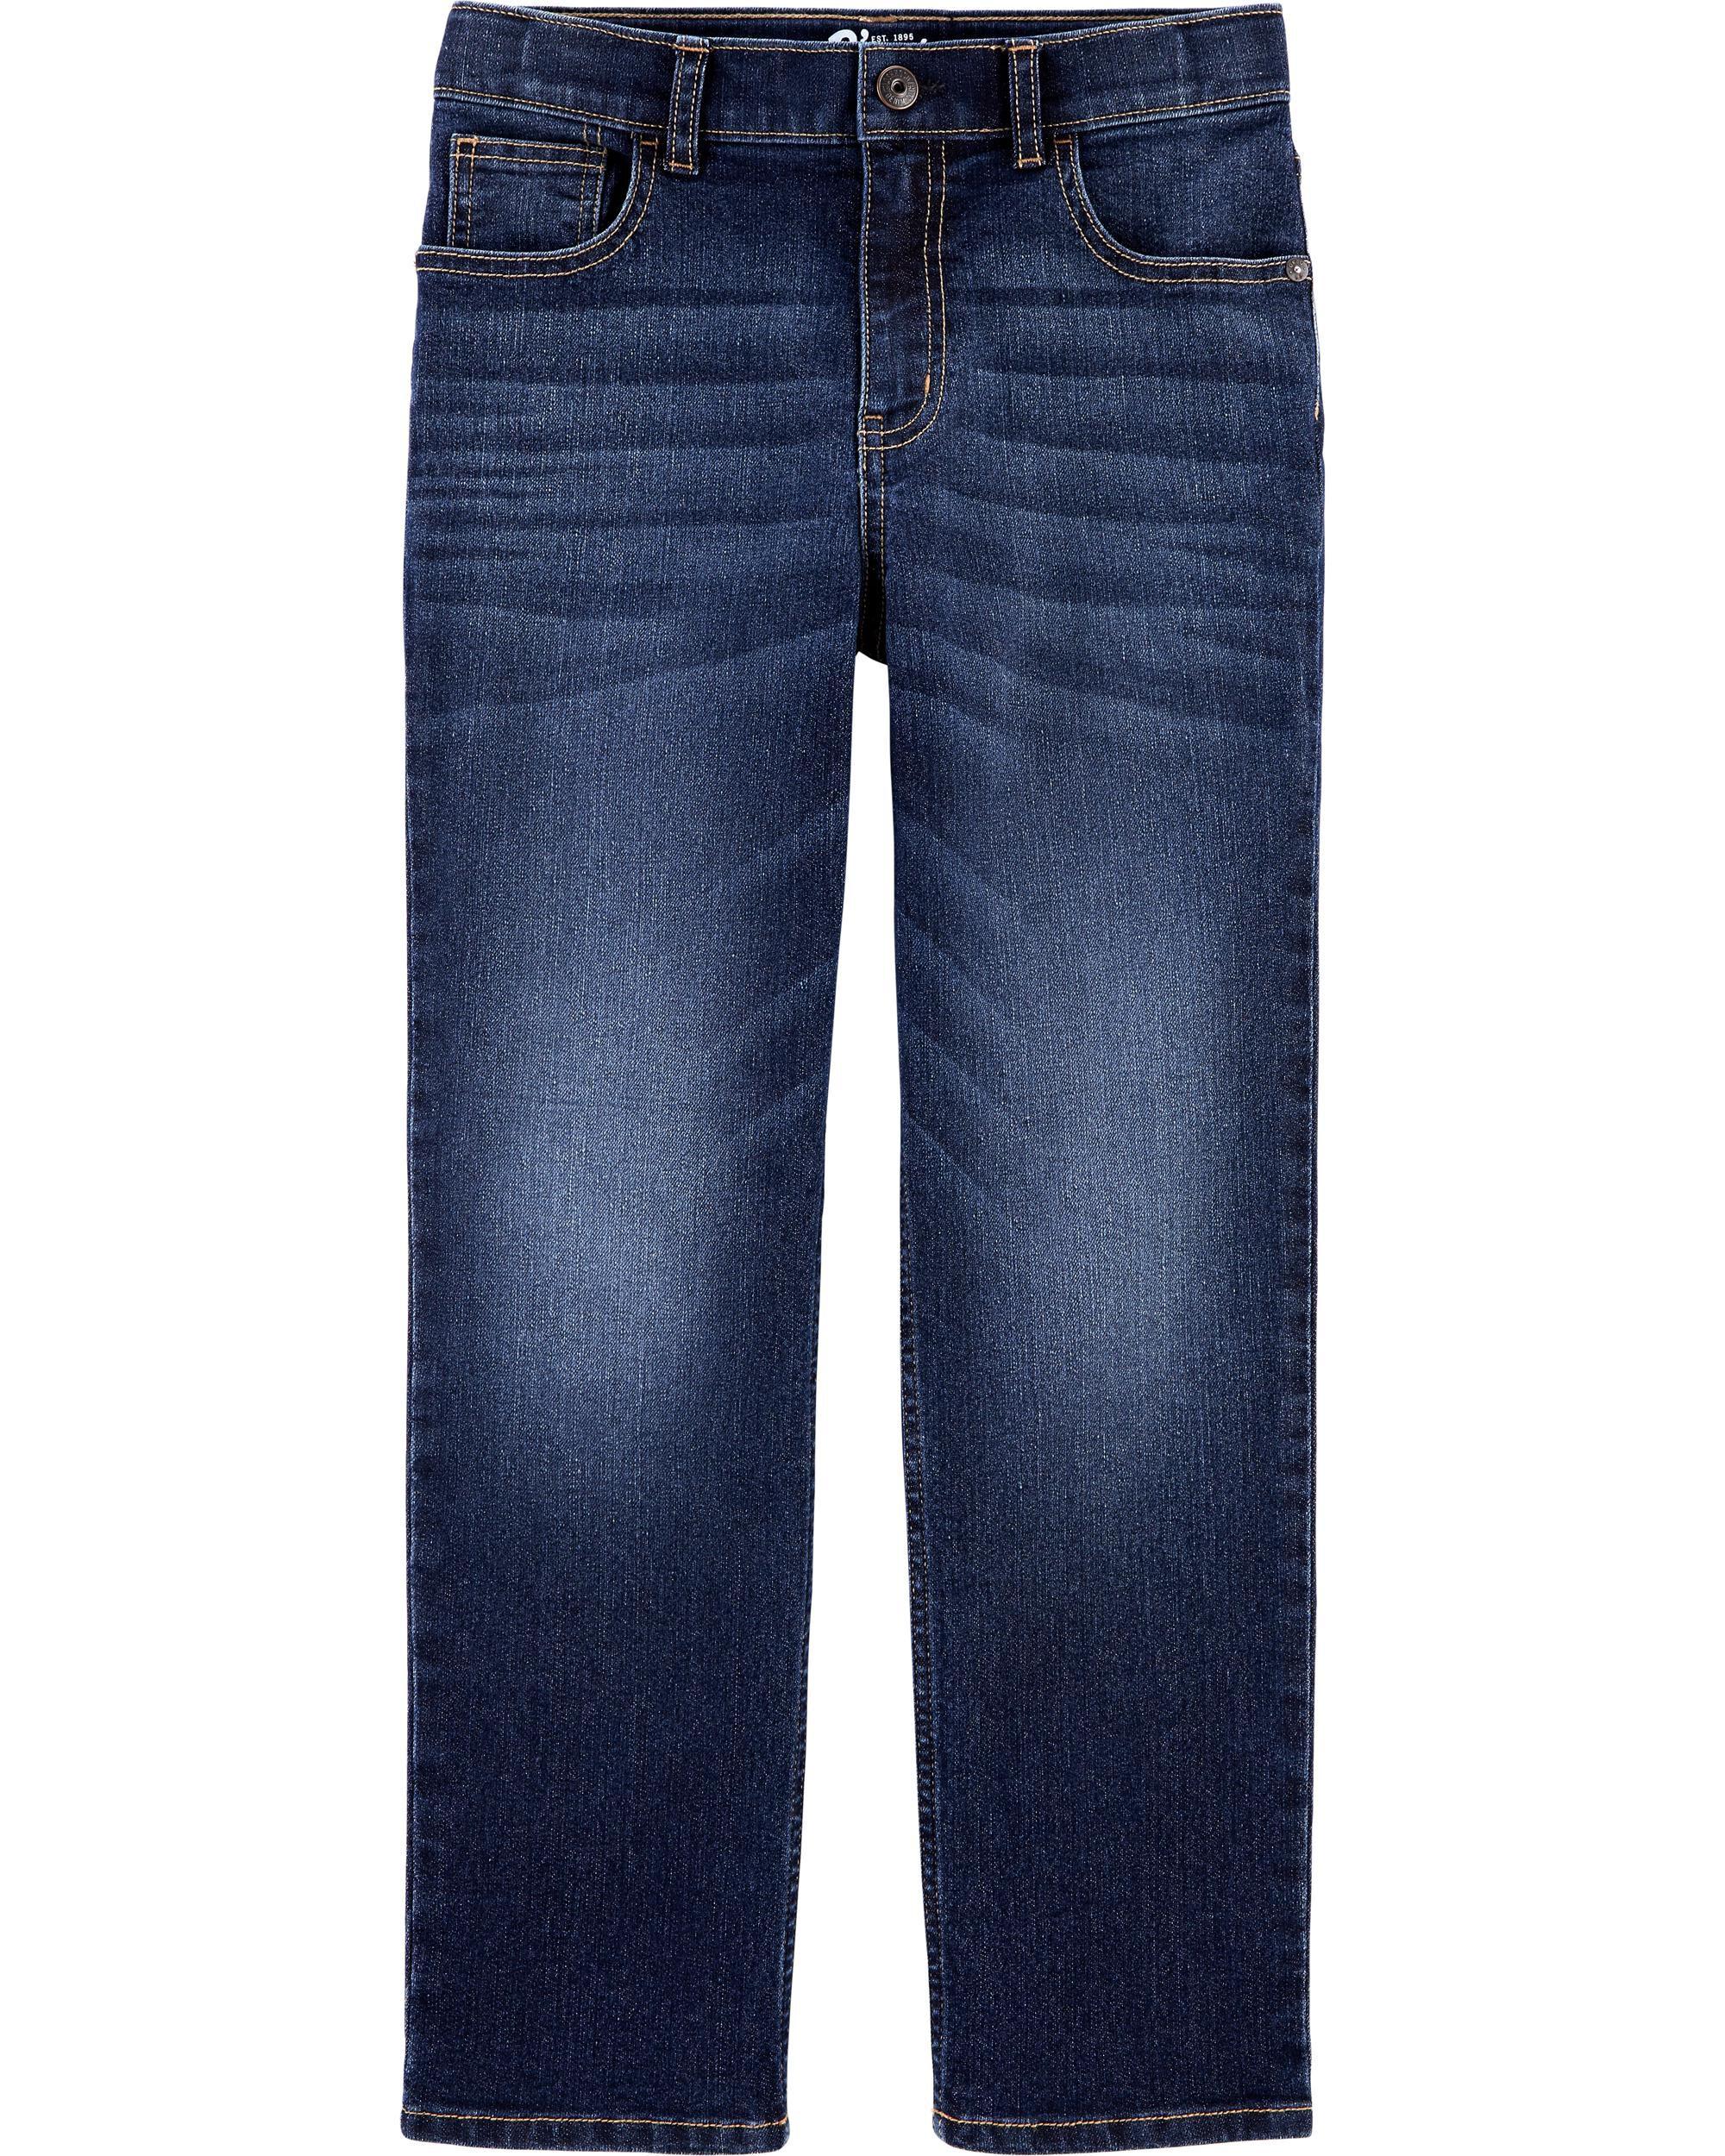 *DOORBUSTER*Husky Fit Classic Jeans - Rail Tie True Blue Wash